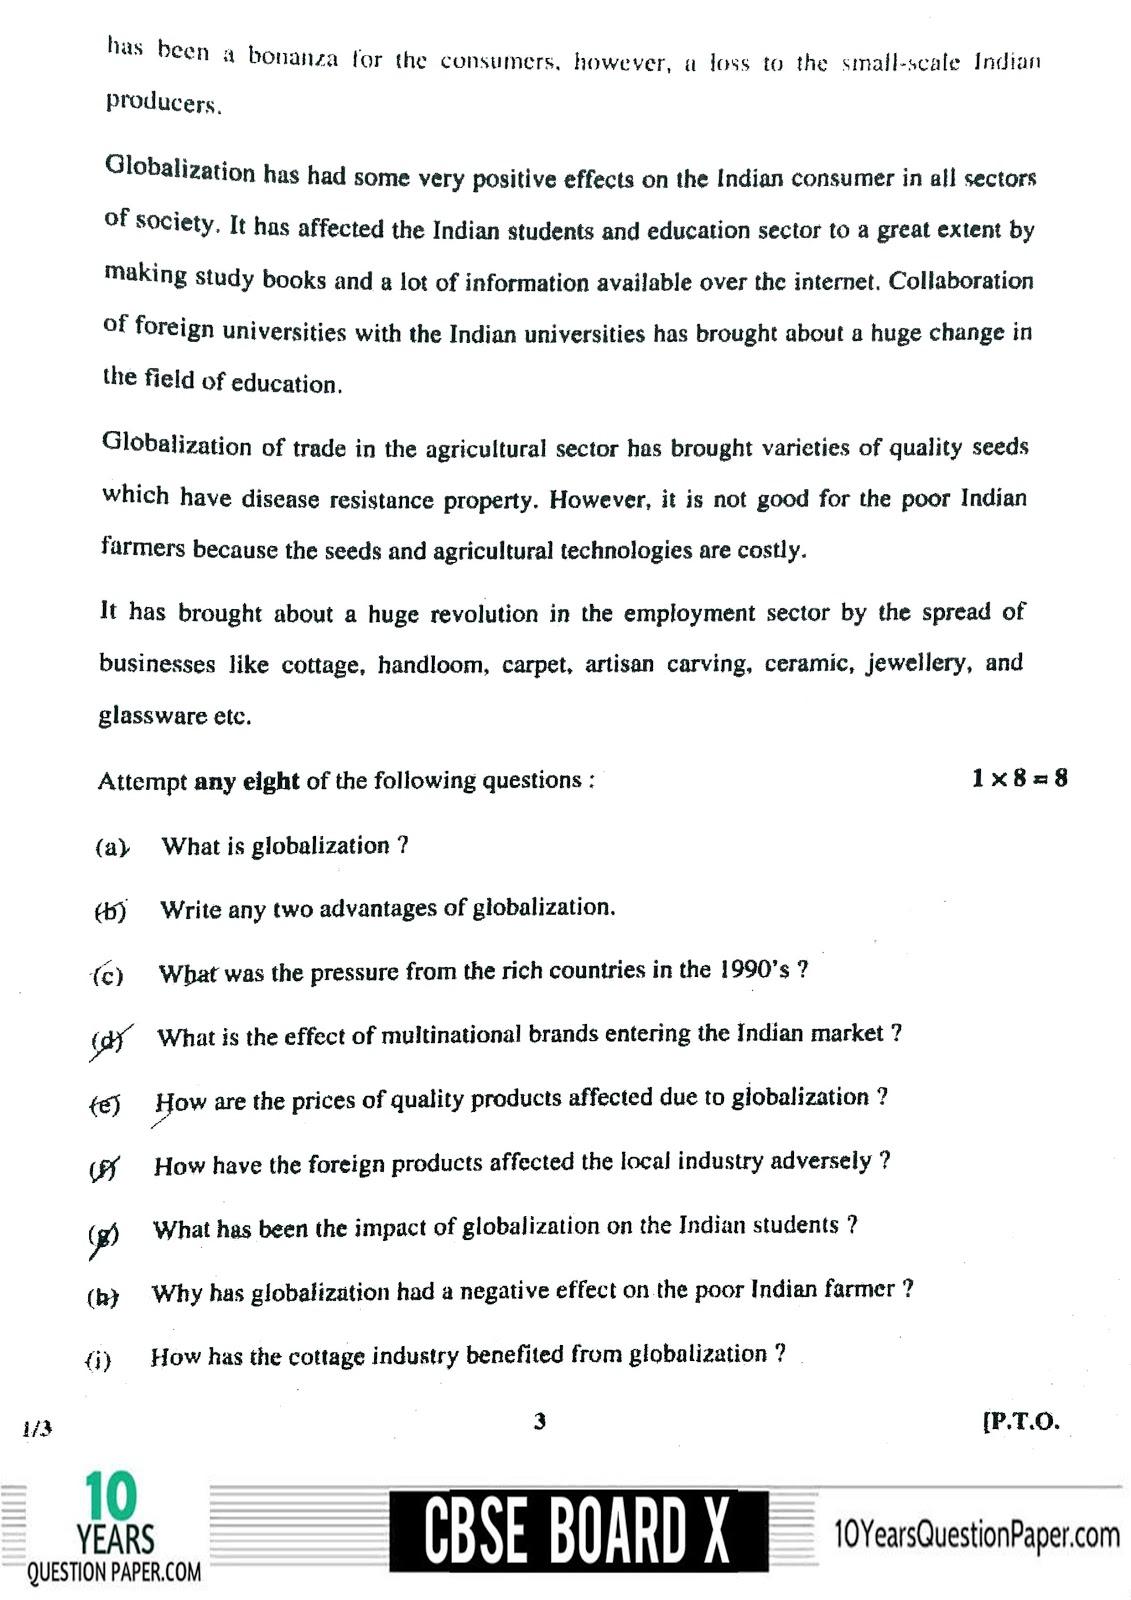 Cbse English Answer Sheet 2019 - Rajasthan Board i